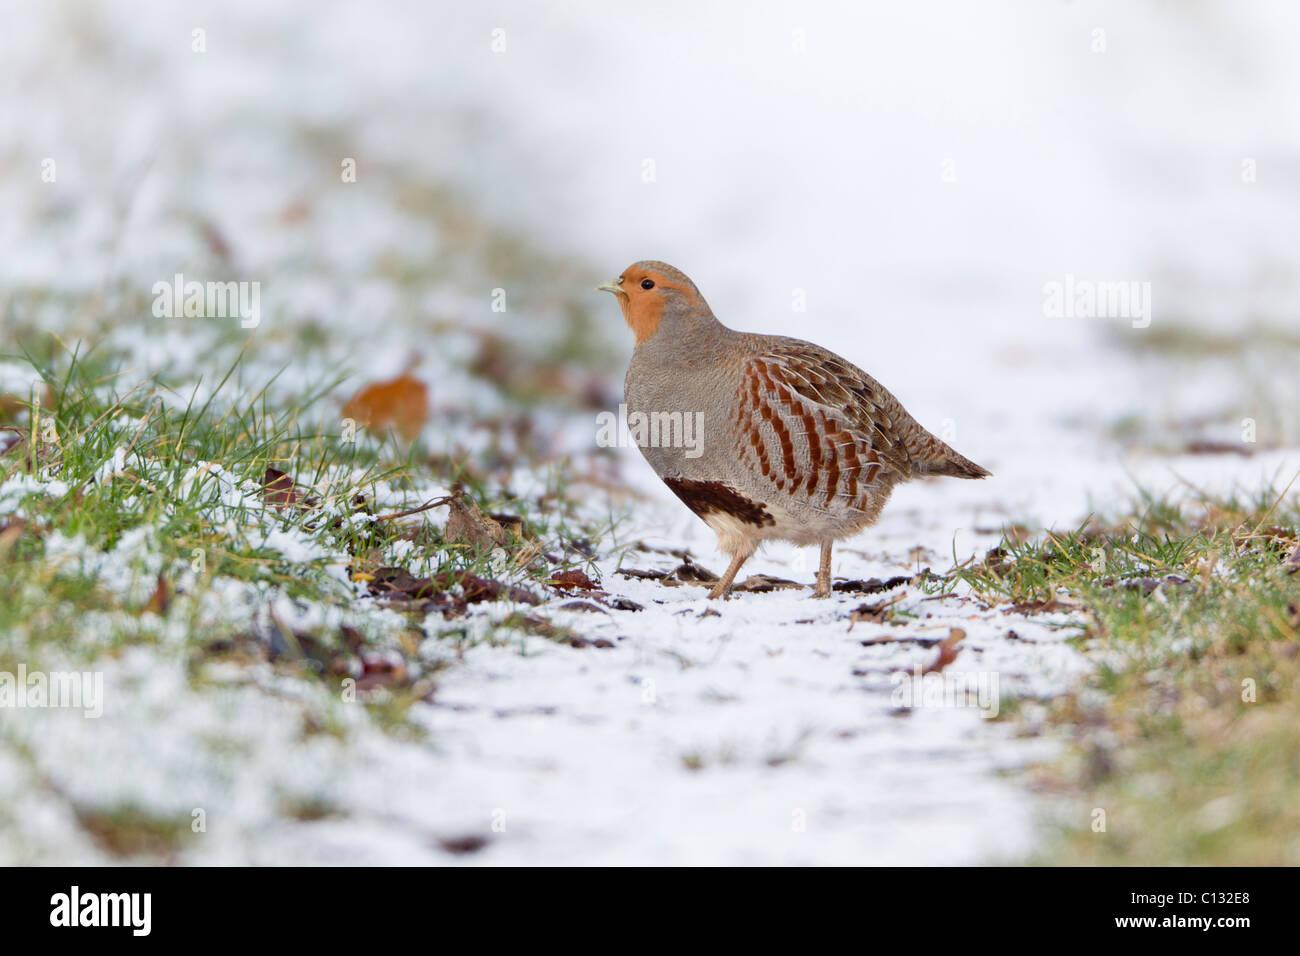 Grey Partridge (Perdix perdix), bird on field track in winter - Stock Image